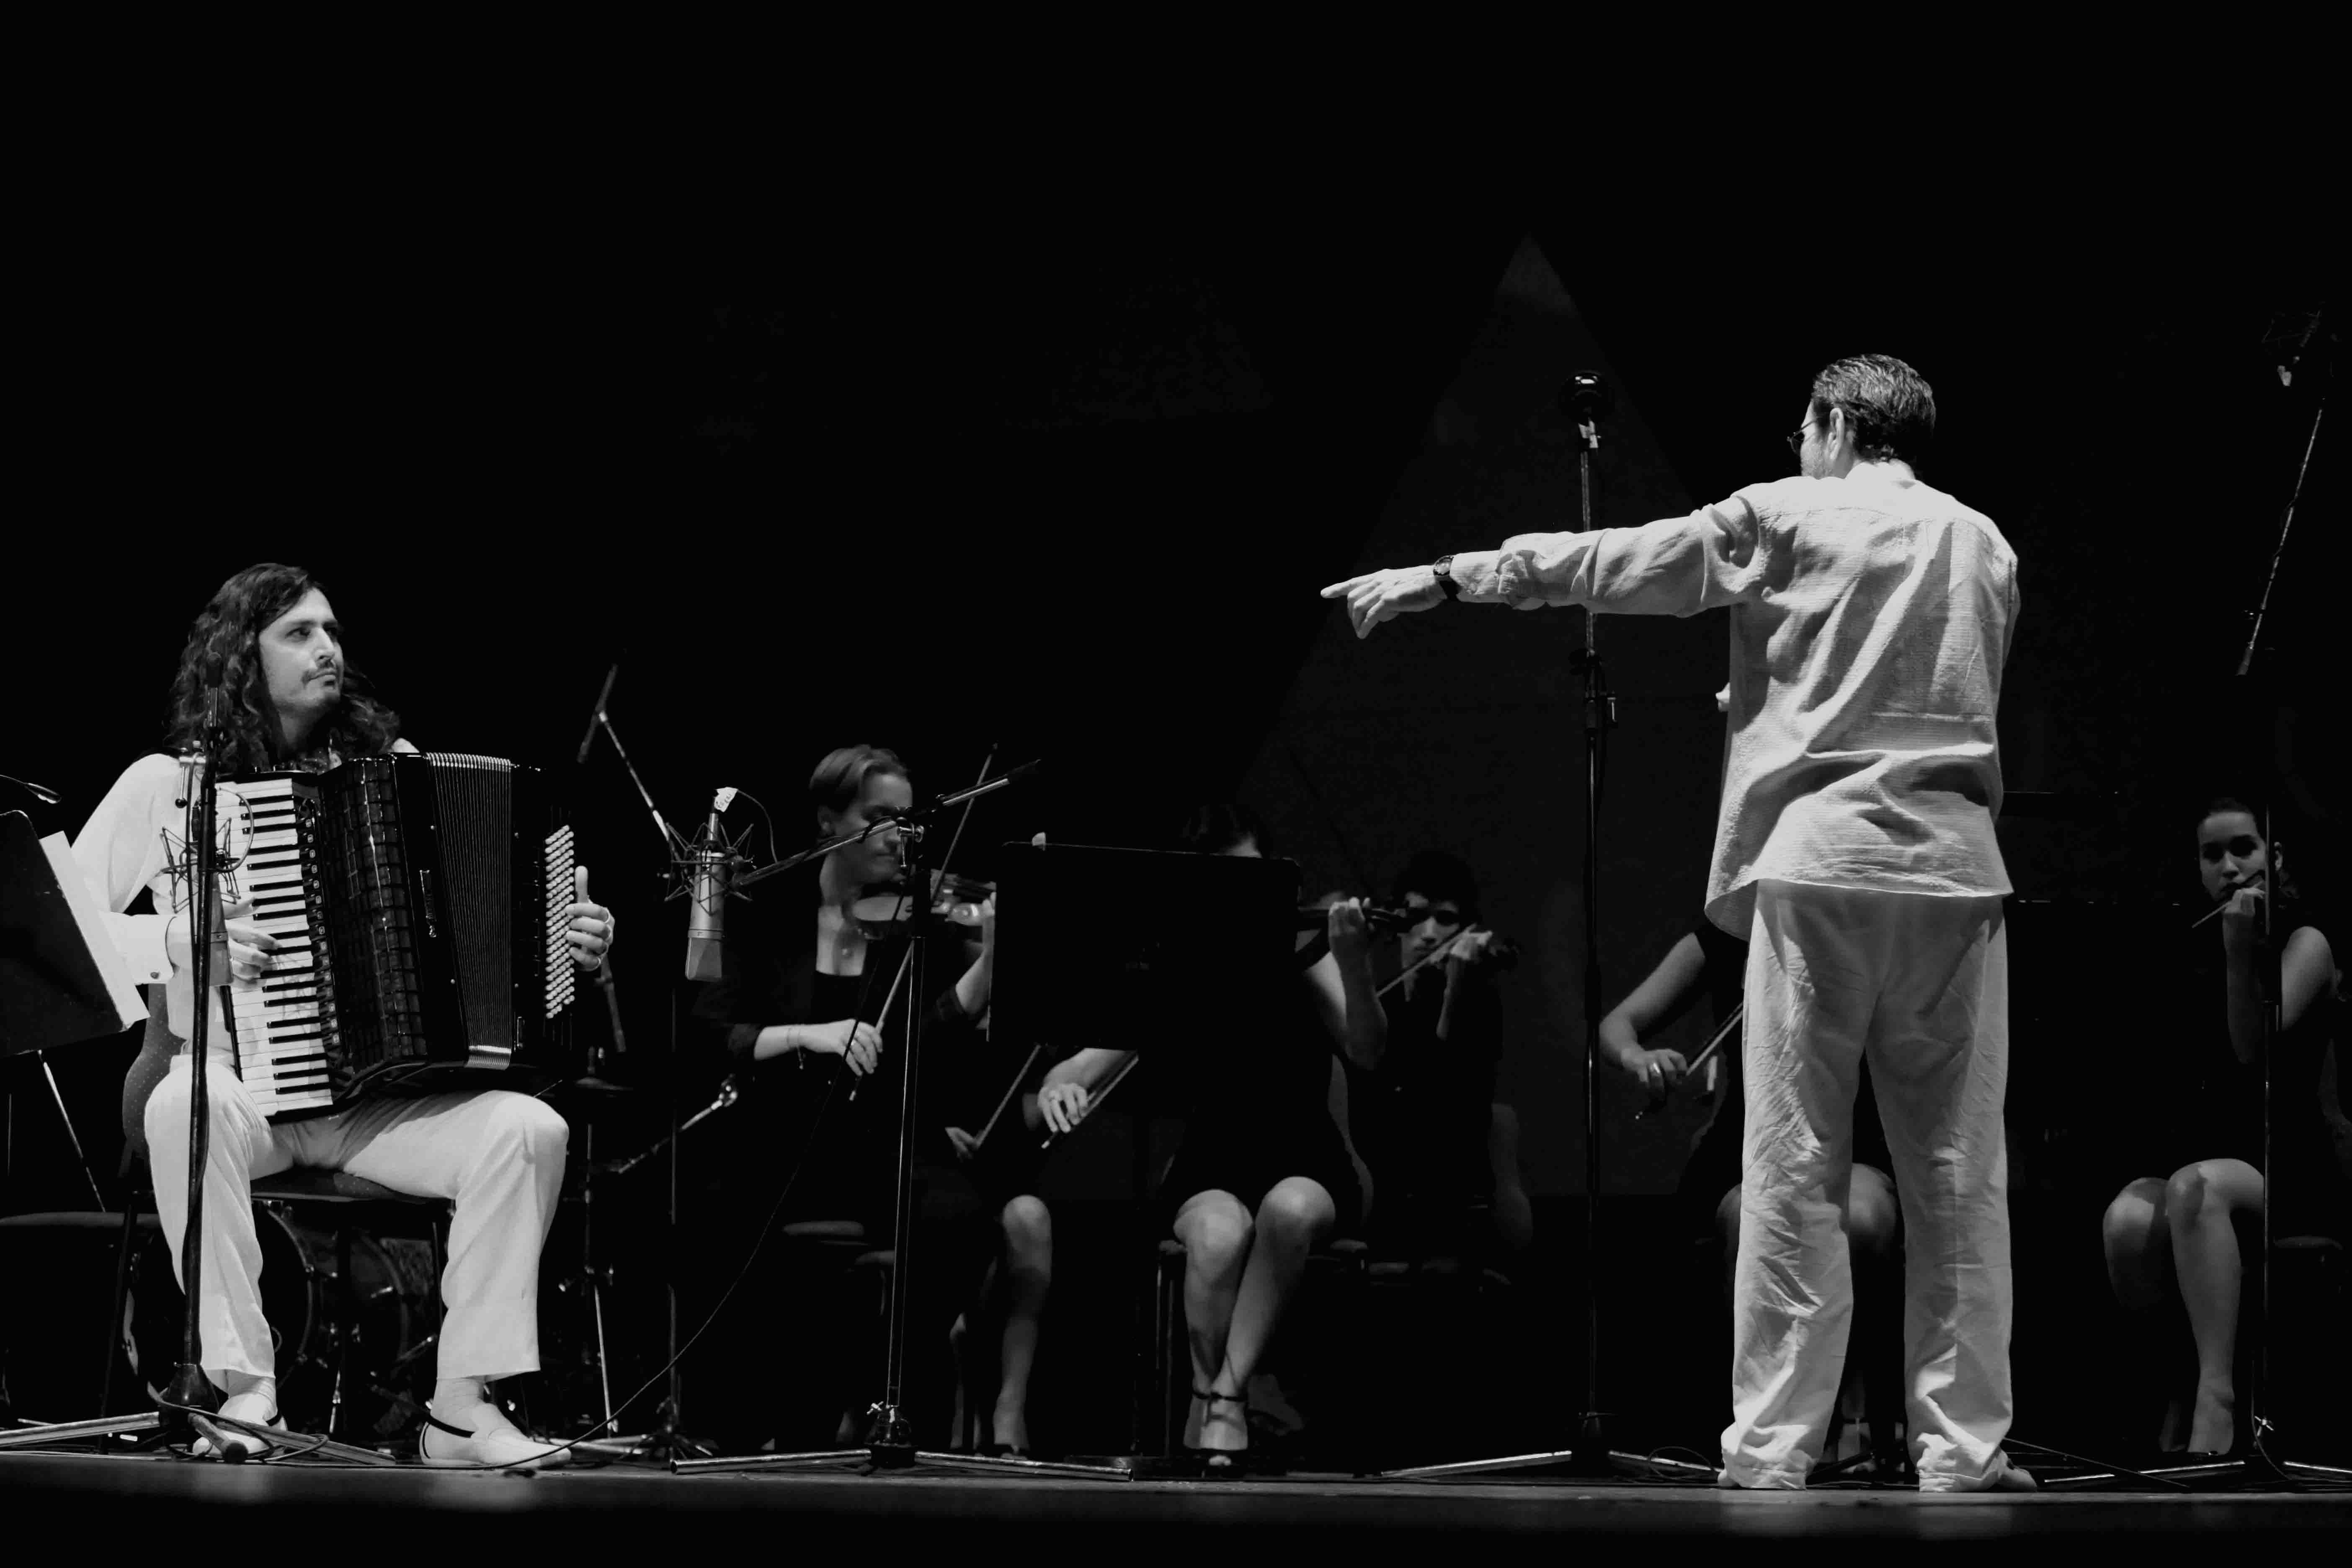 Marco Lo Russo Leo Brouwer Orchestra de La Havana foto by GG Bianchini